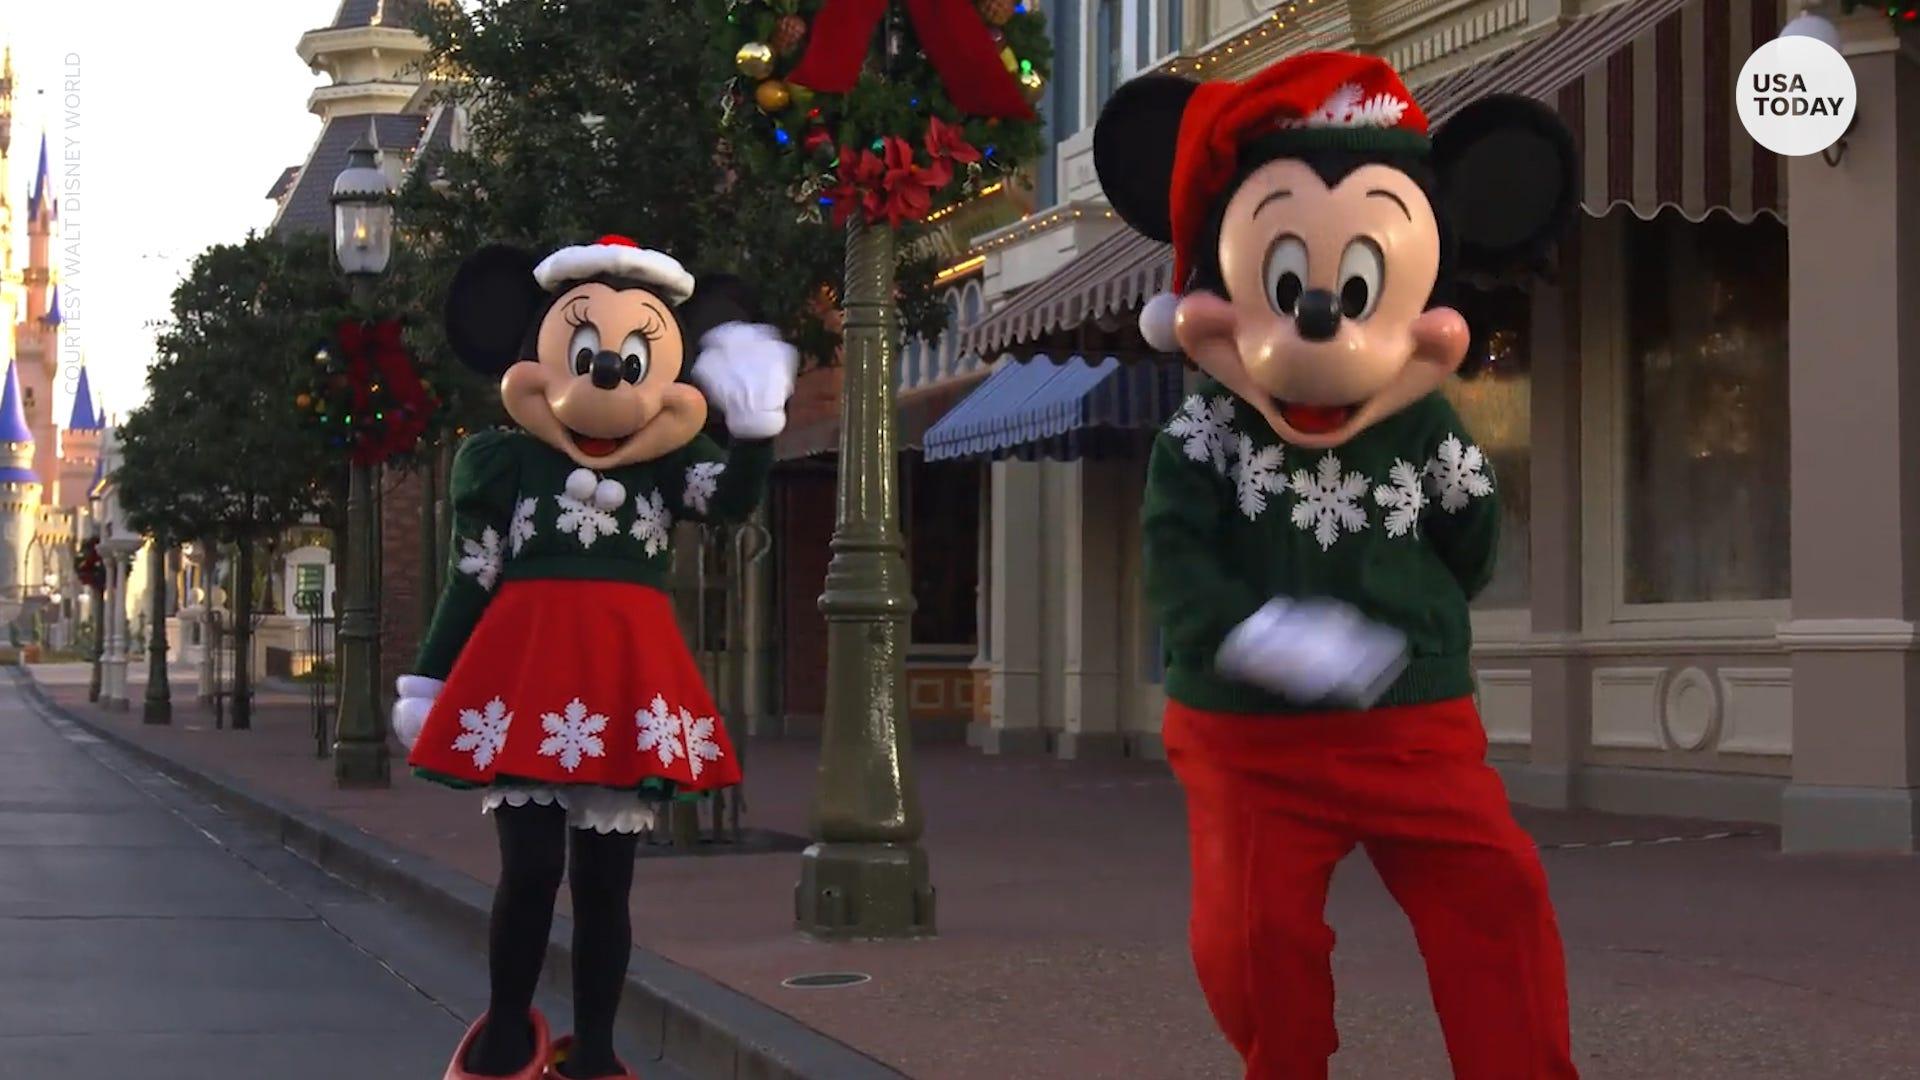 Disney announces 'reimagined holiday celebration' starting in November